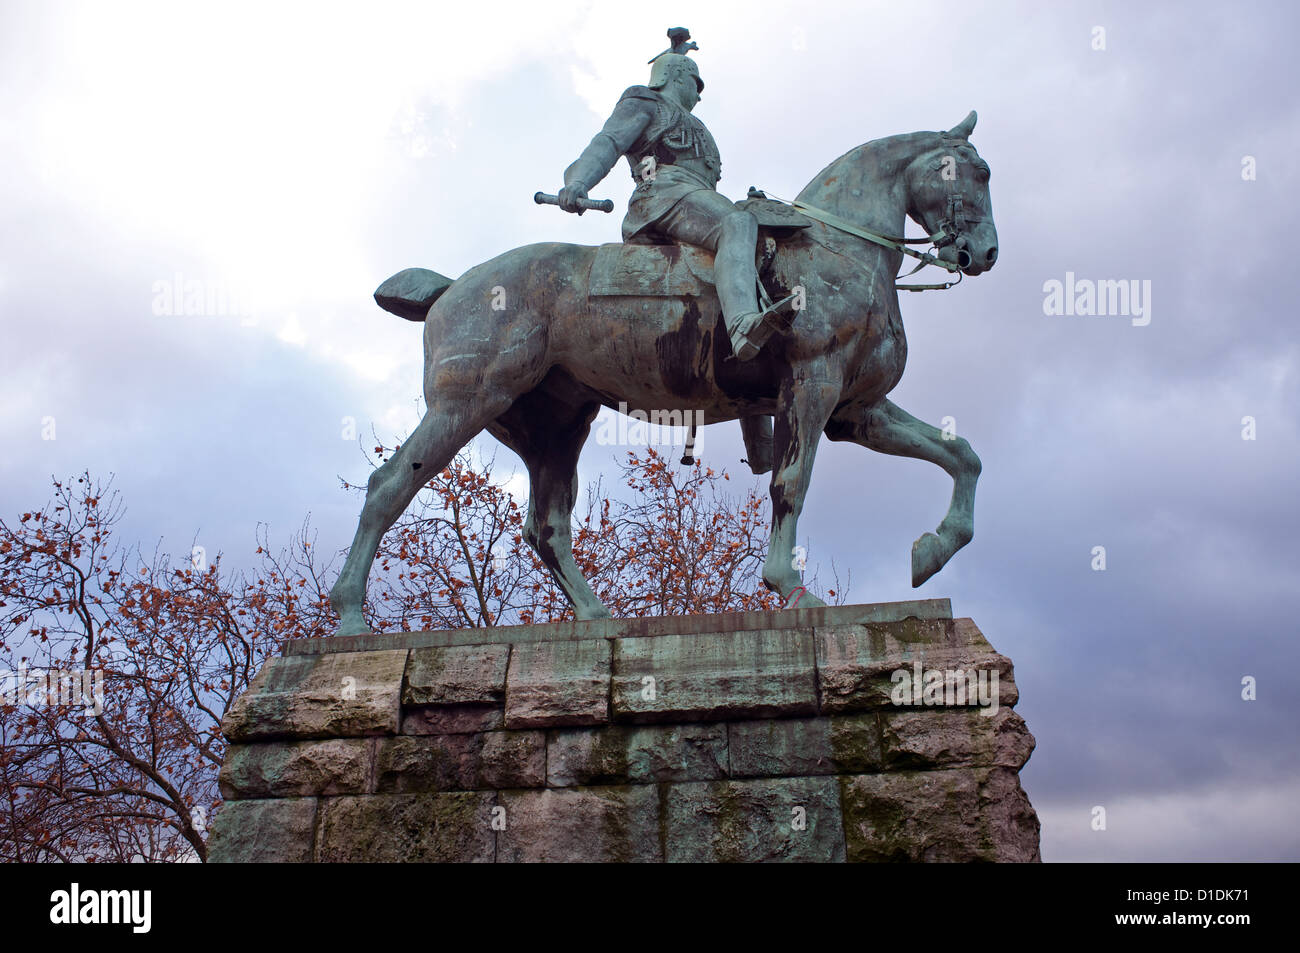 Emperor Wilhelm II statue, Cologne, Germany. Stock Photo